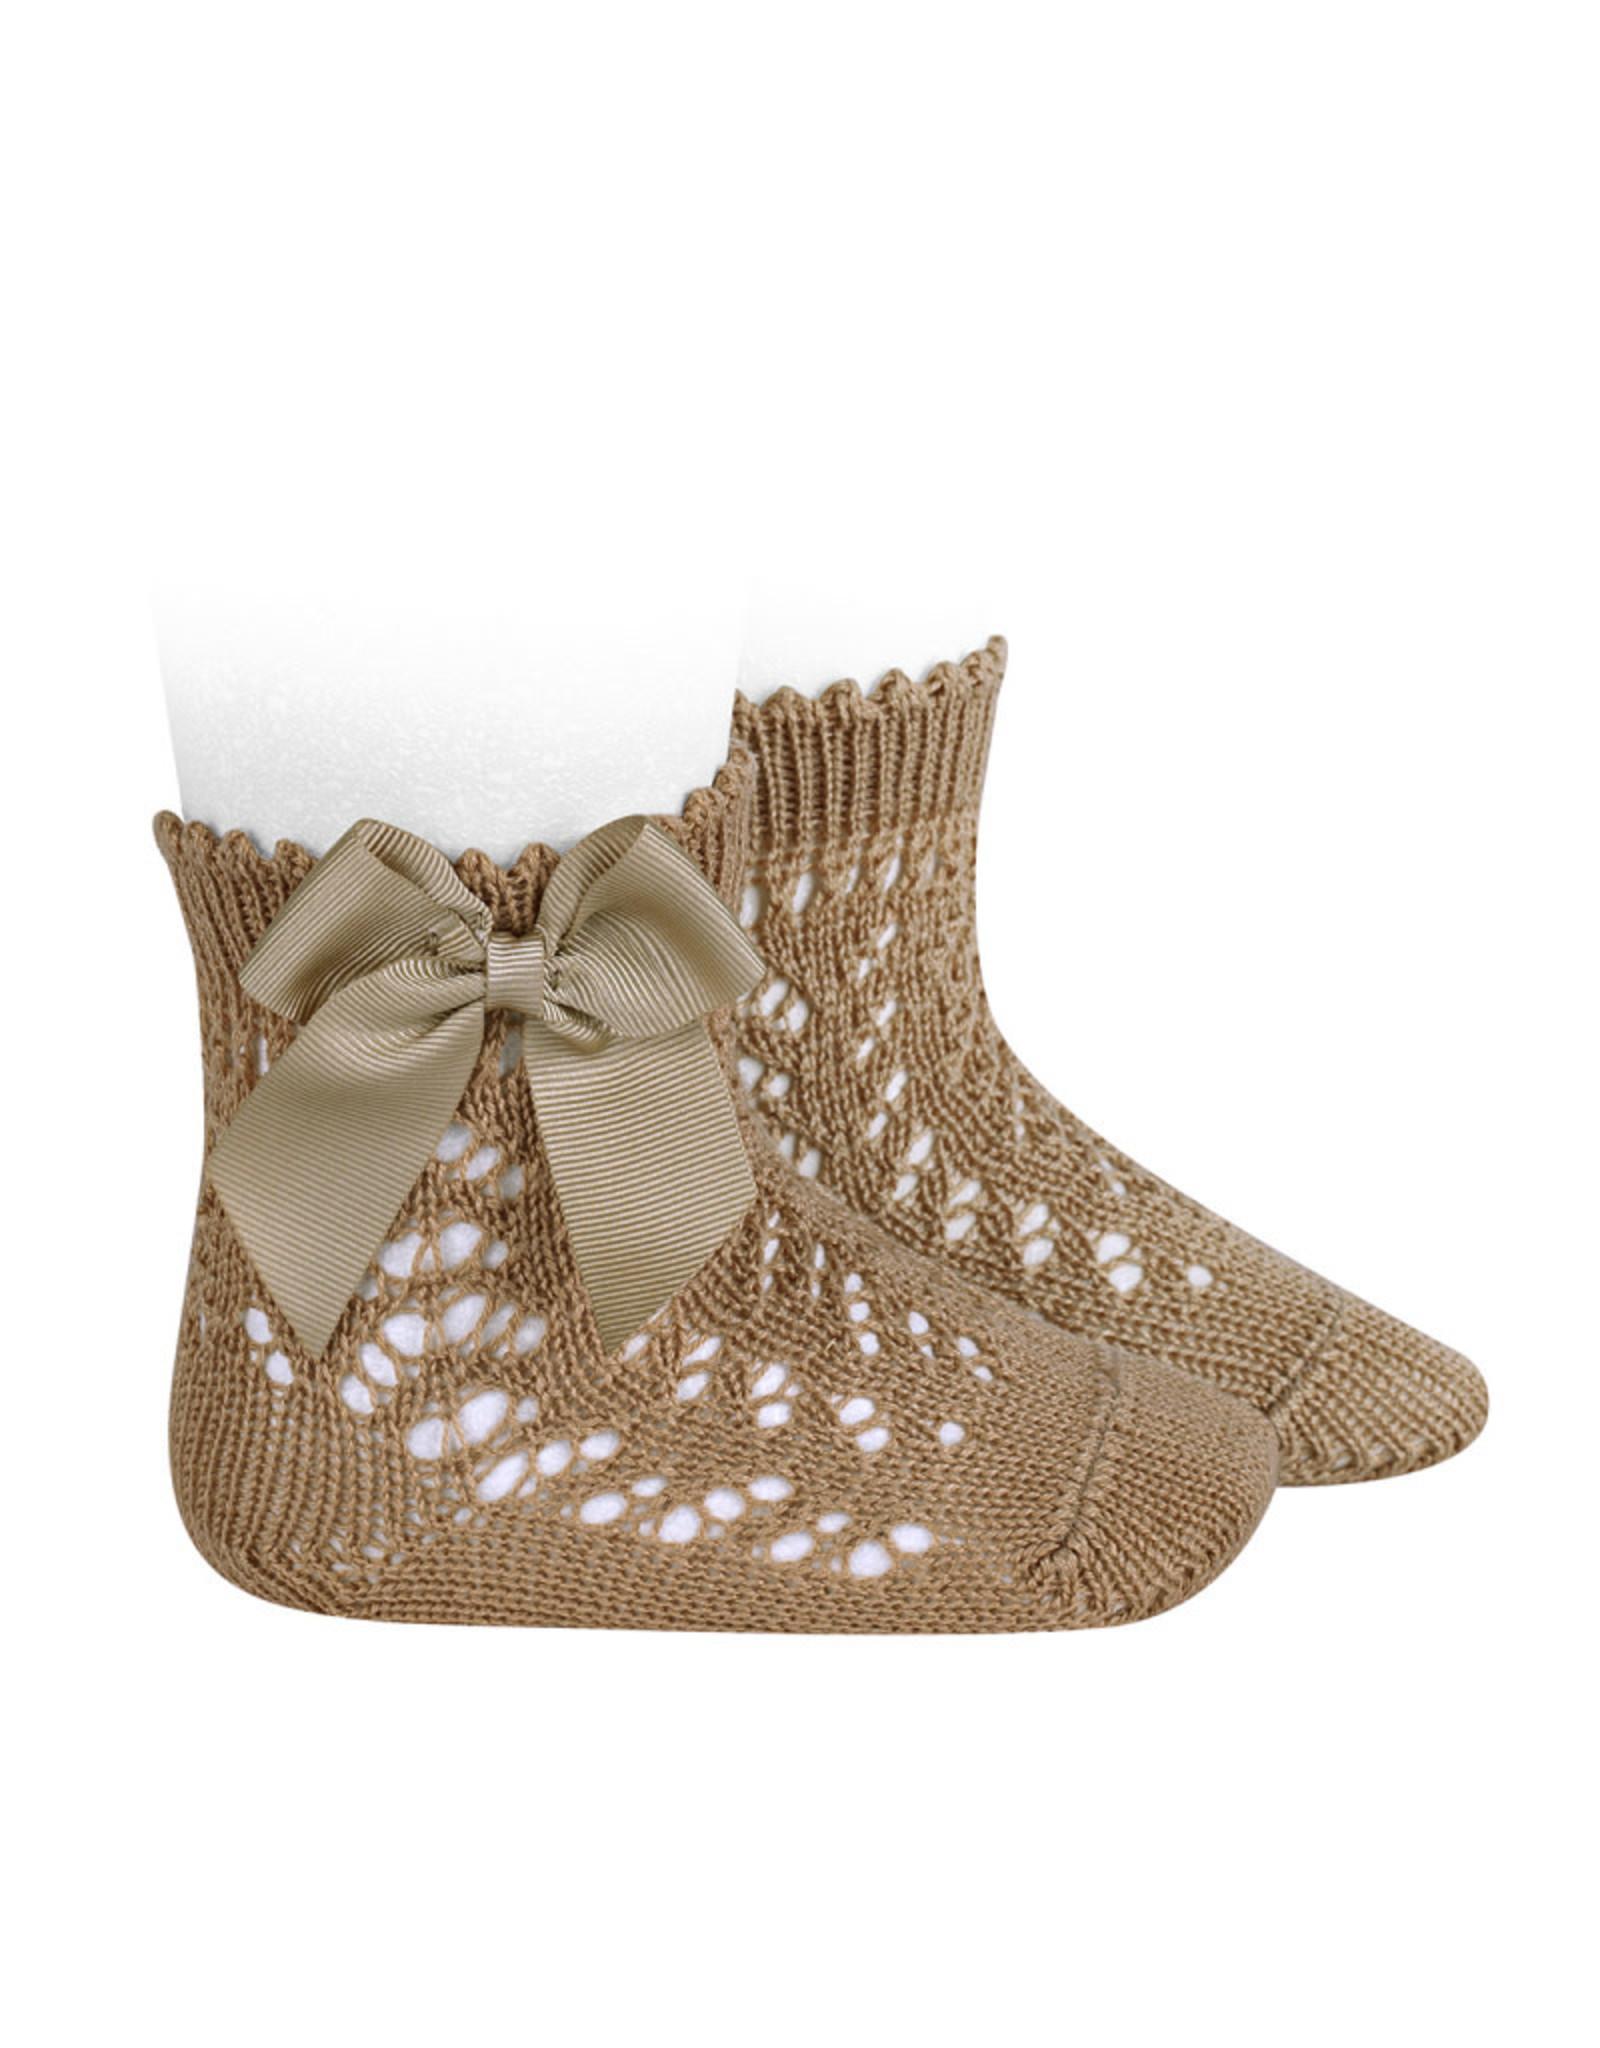 CONDOR Camel Openwork Short Socks with Bow